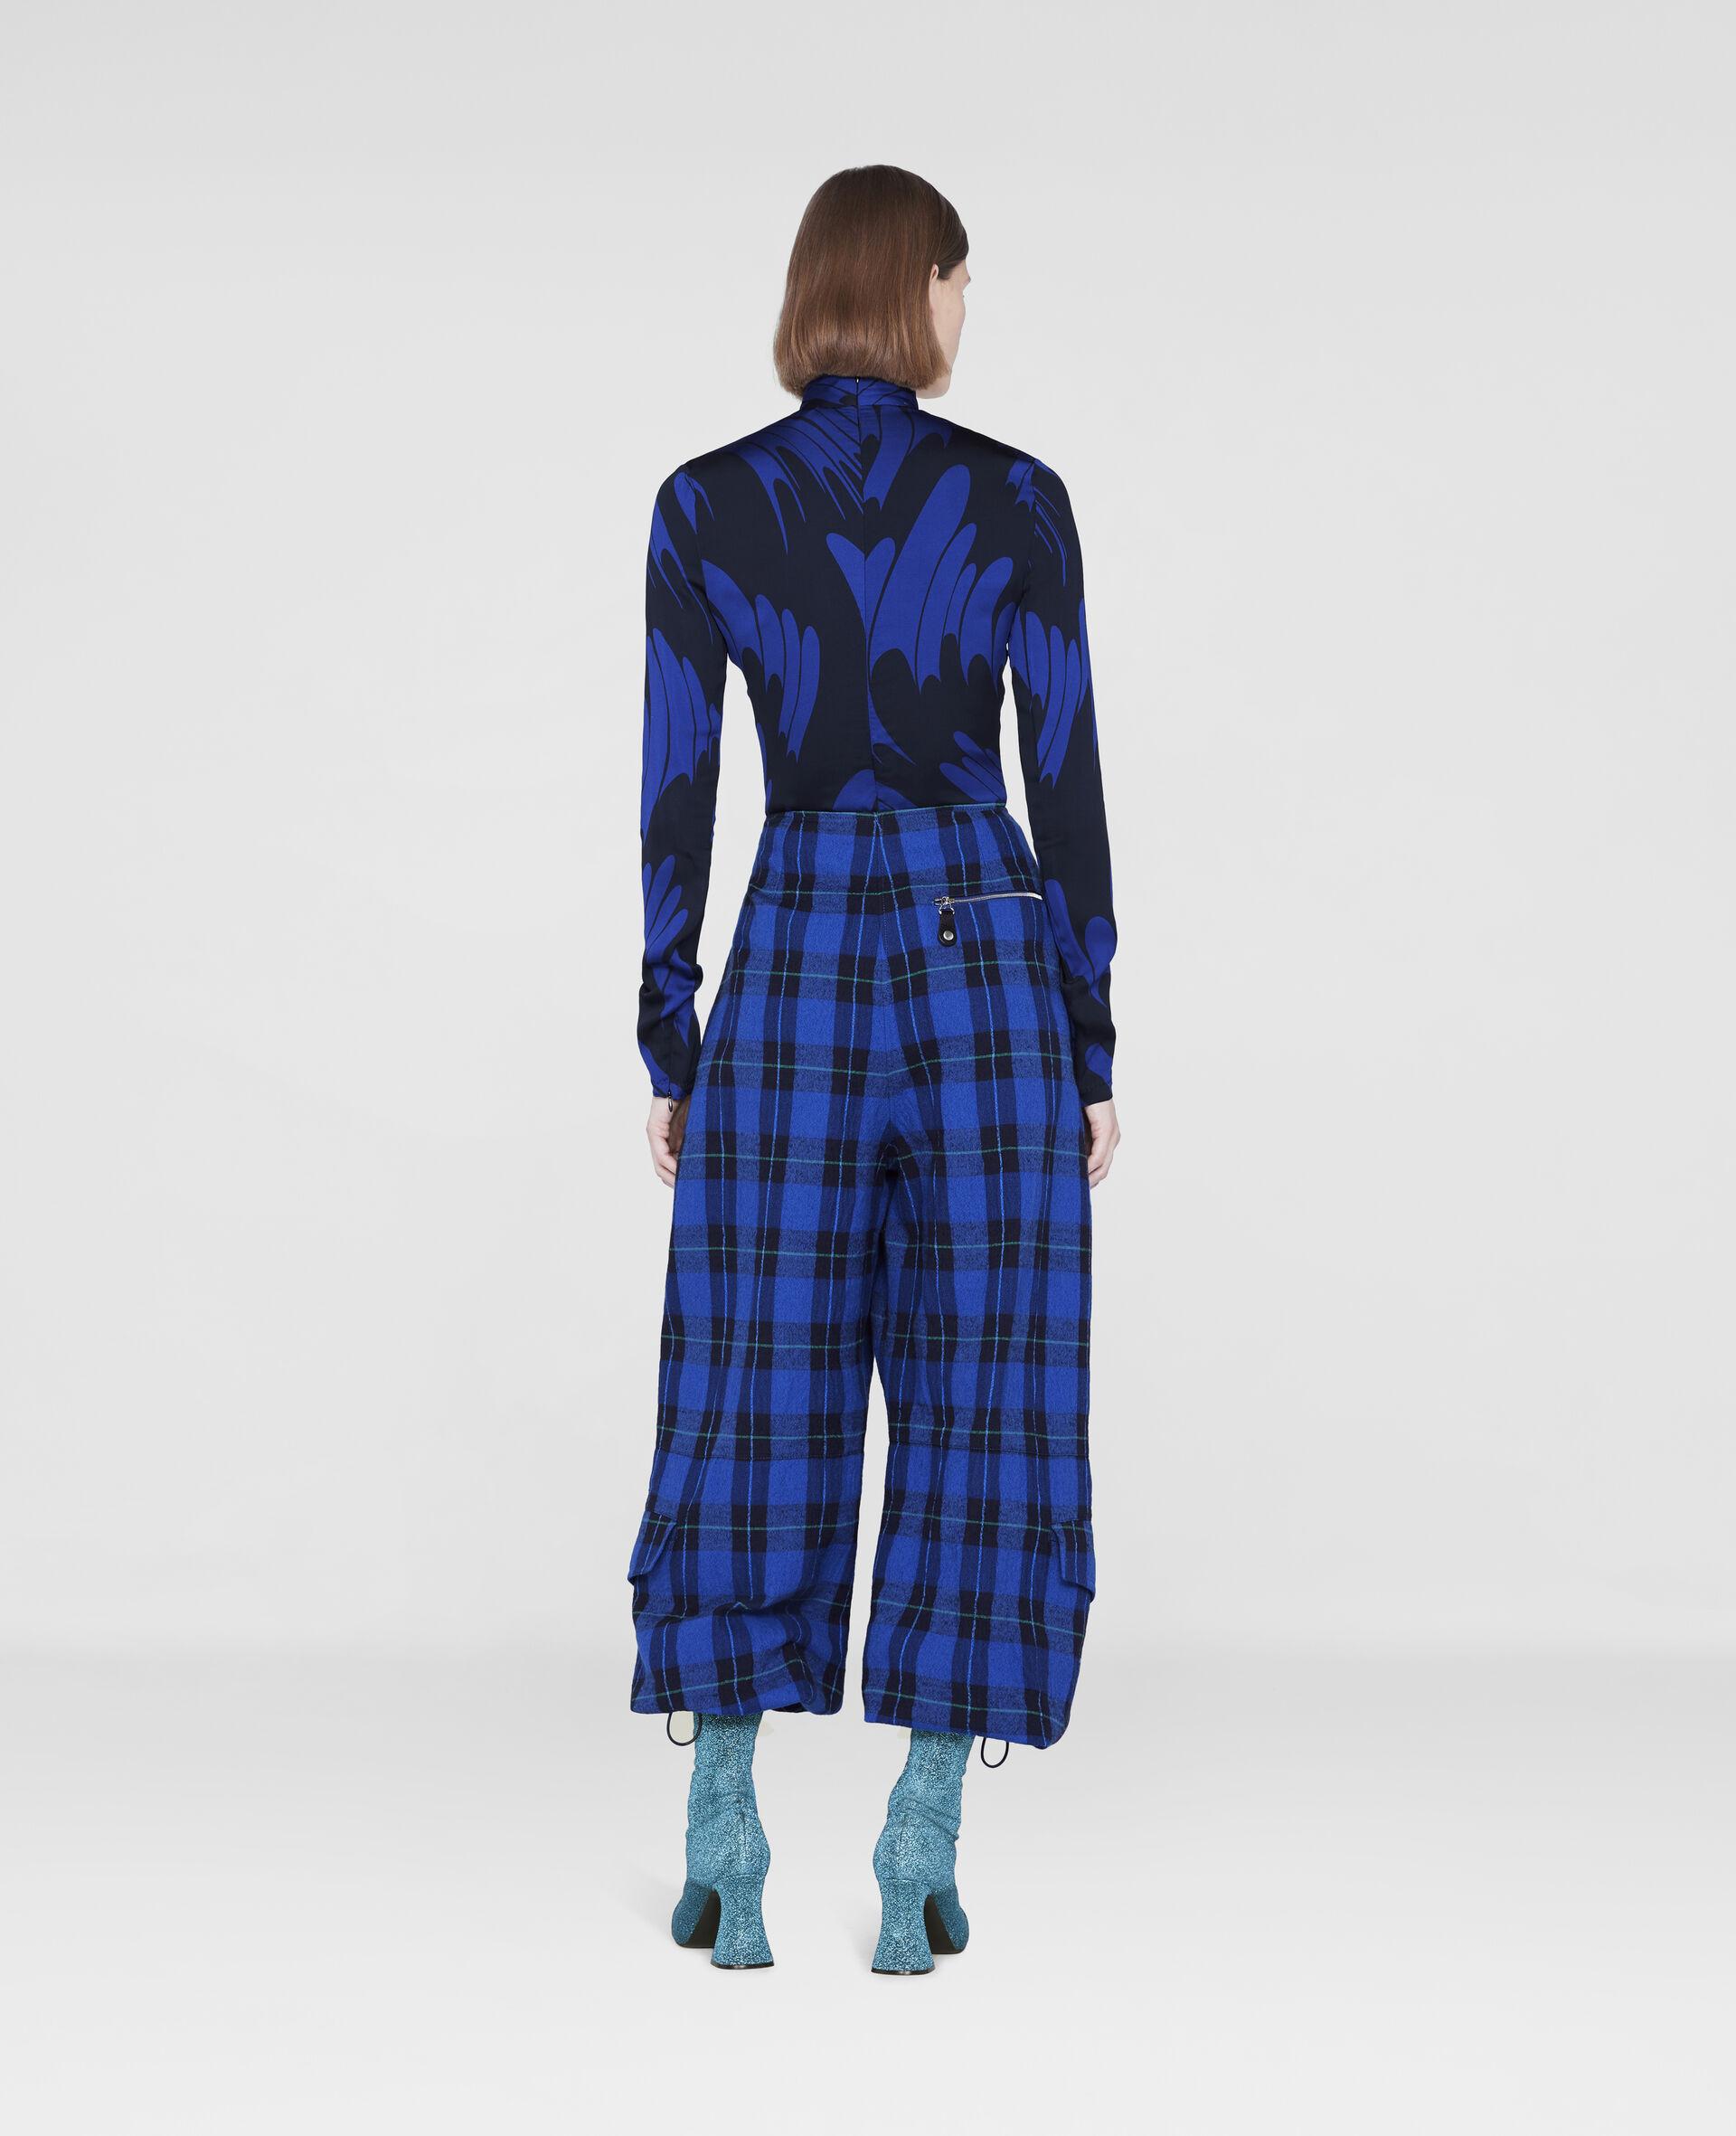 Pantalon Nella-Fantaisie-large image number 2